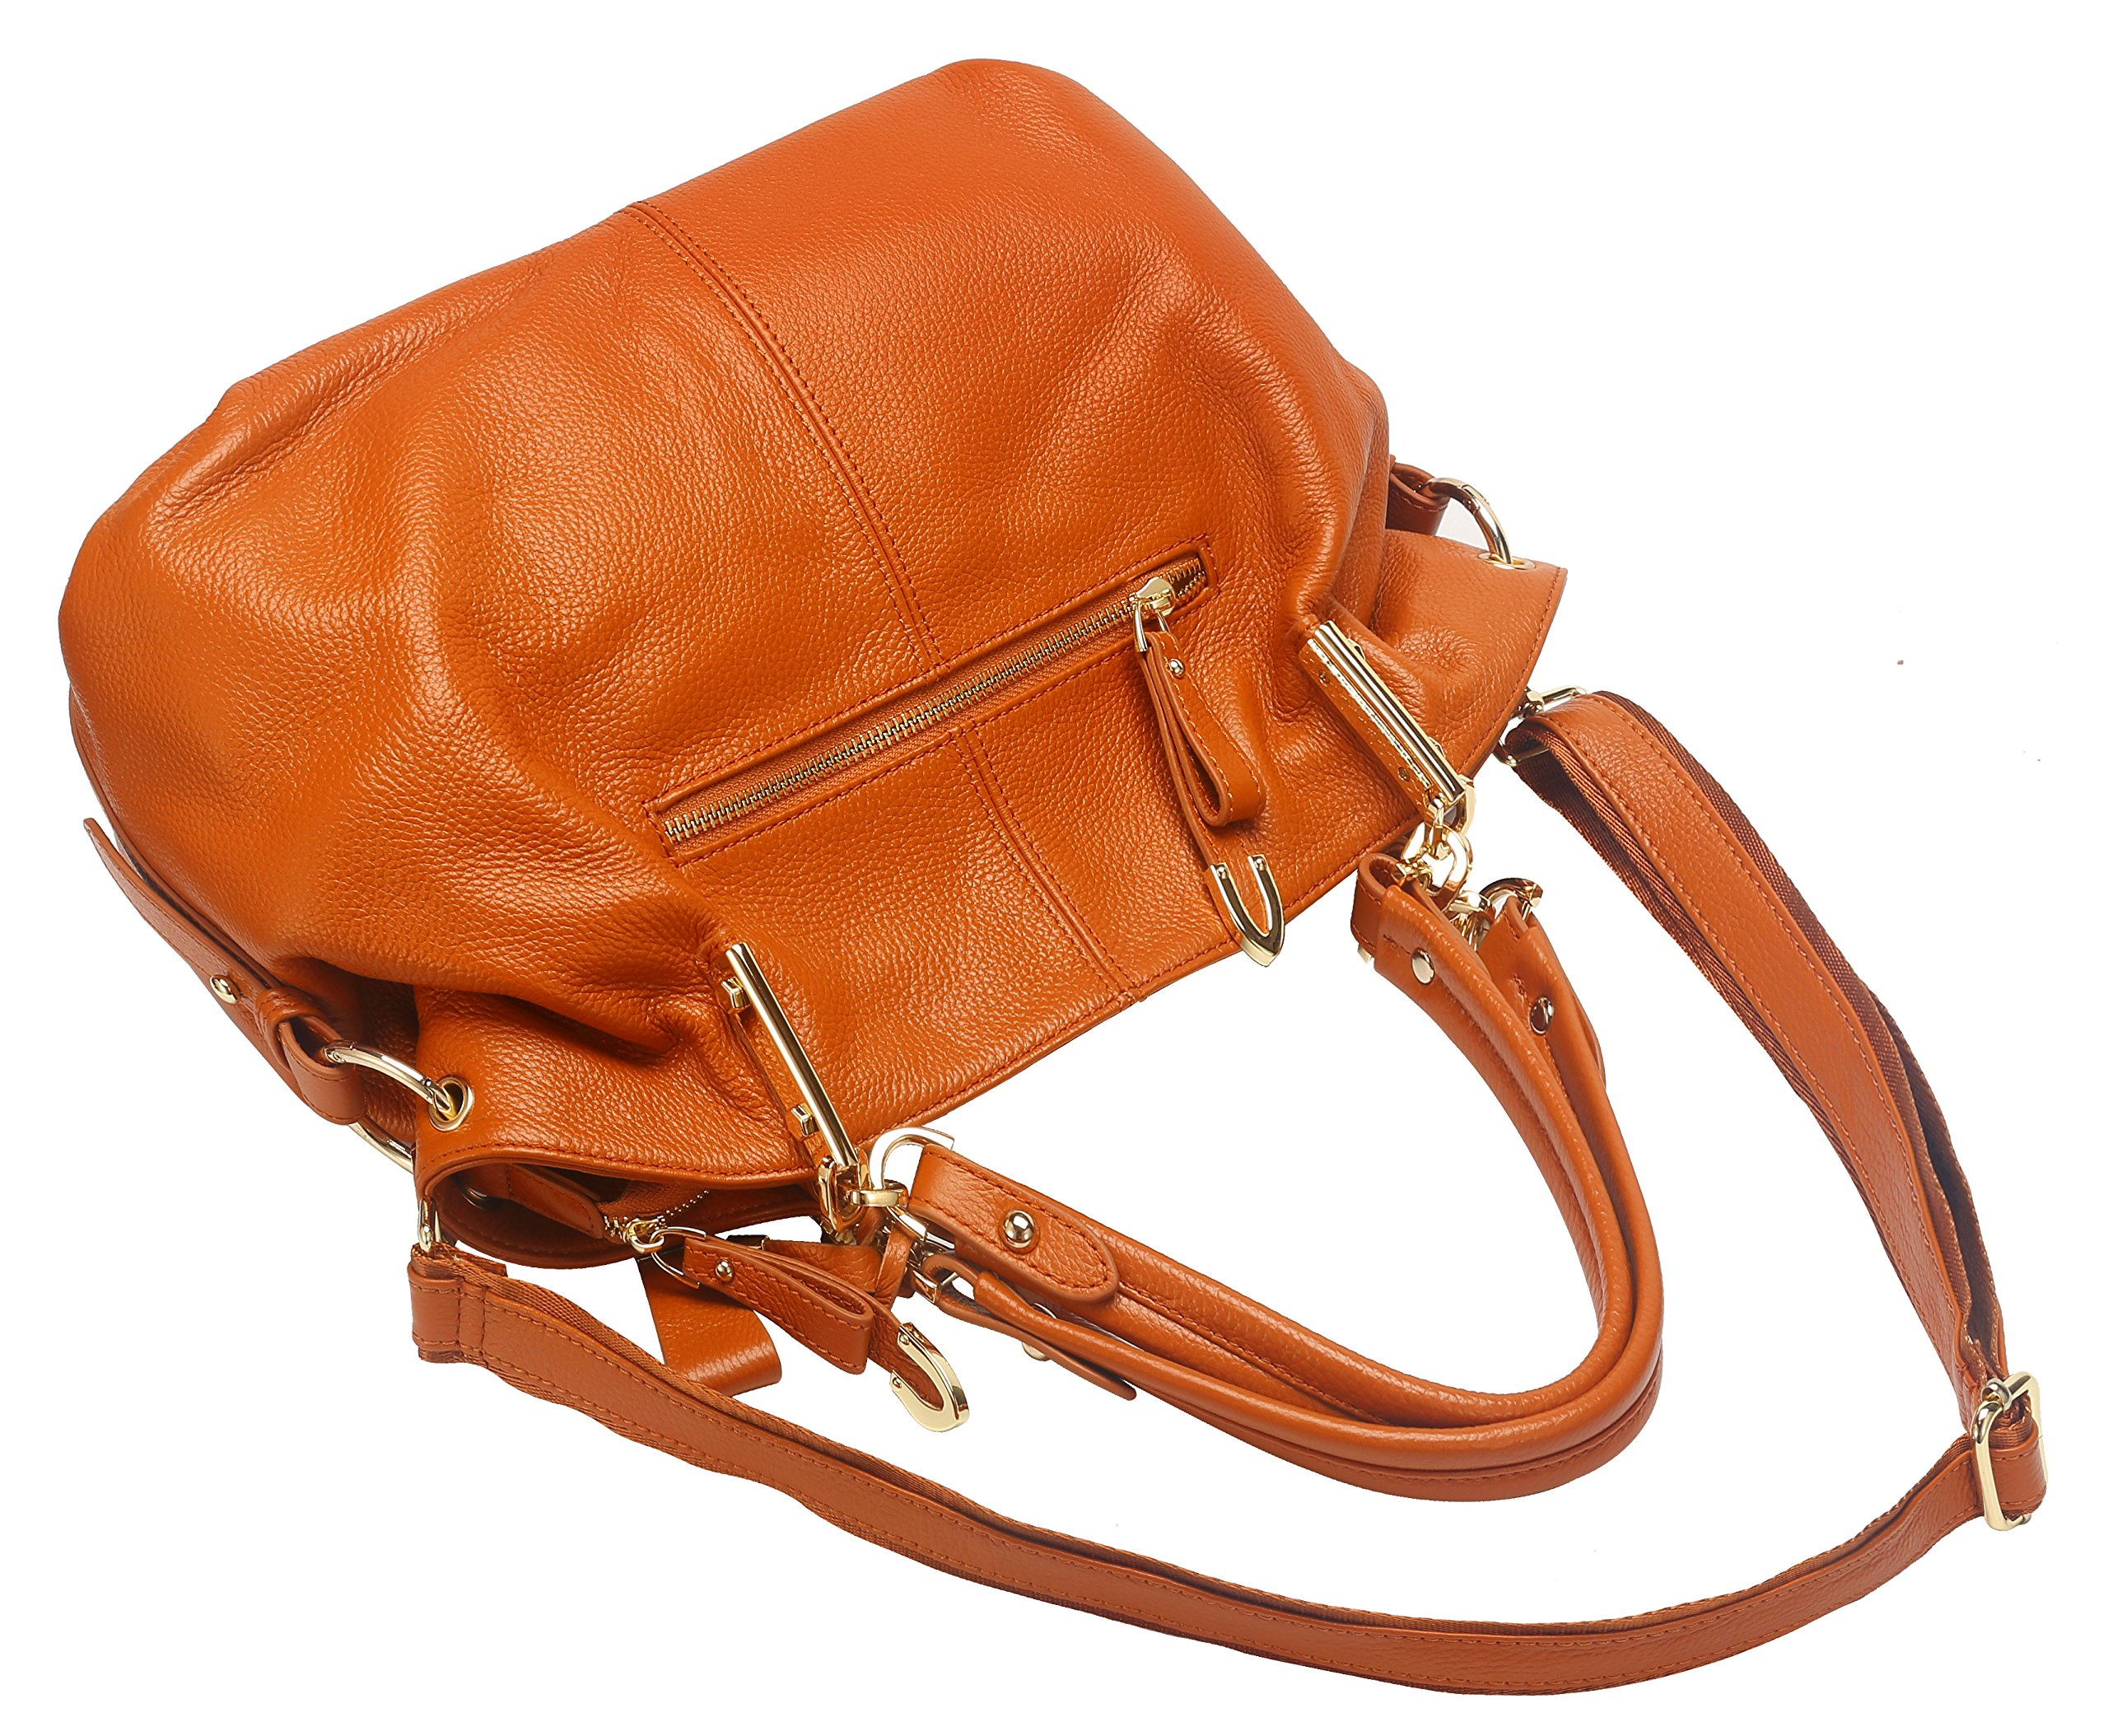 Obosoyo Women's Handbag Genuine Leather Tote Shoulder Bags Soft Hot Brown